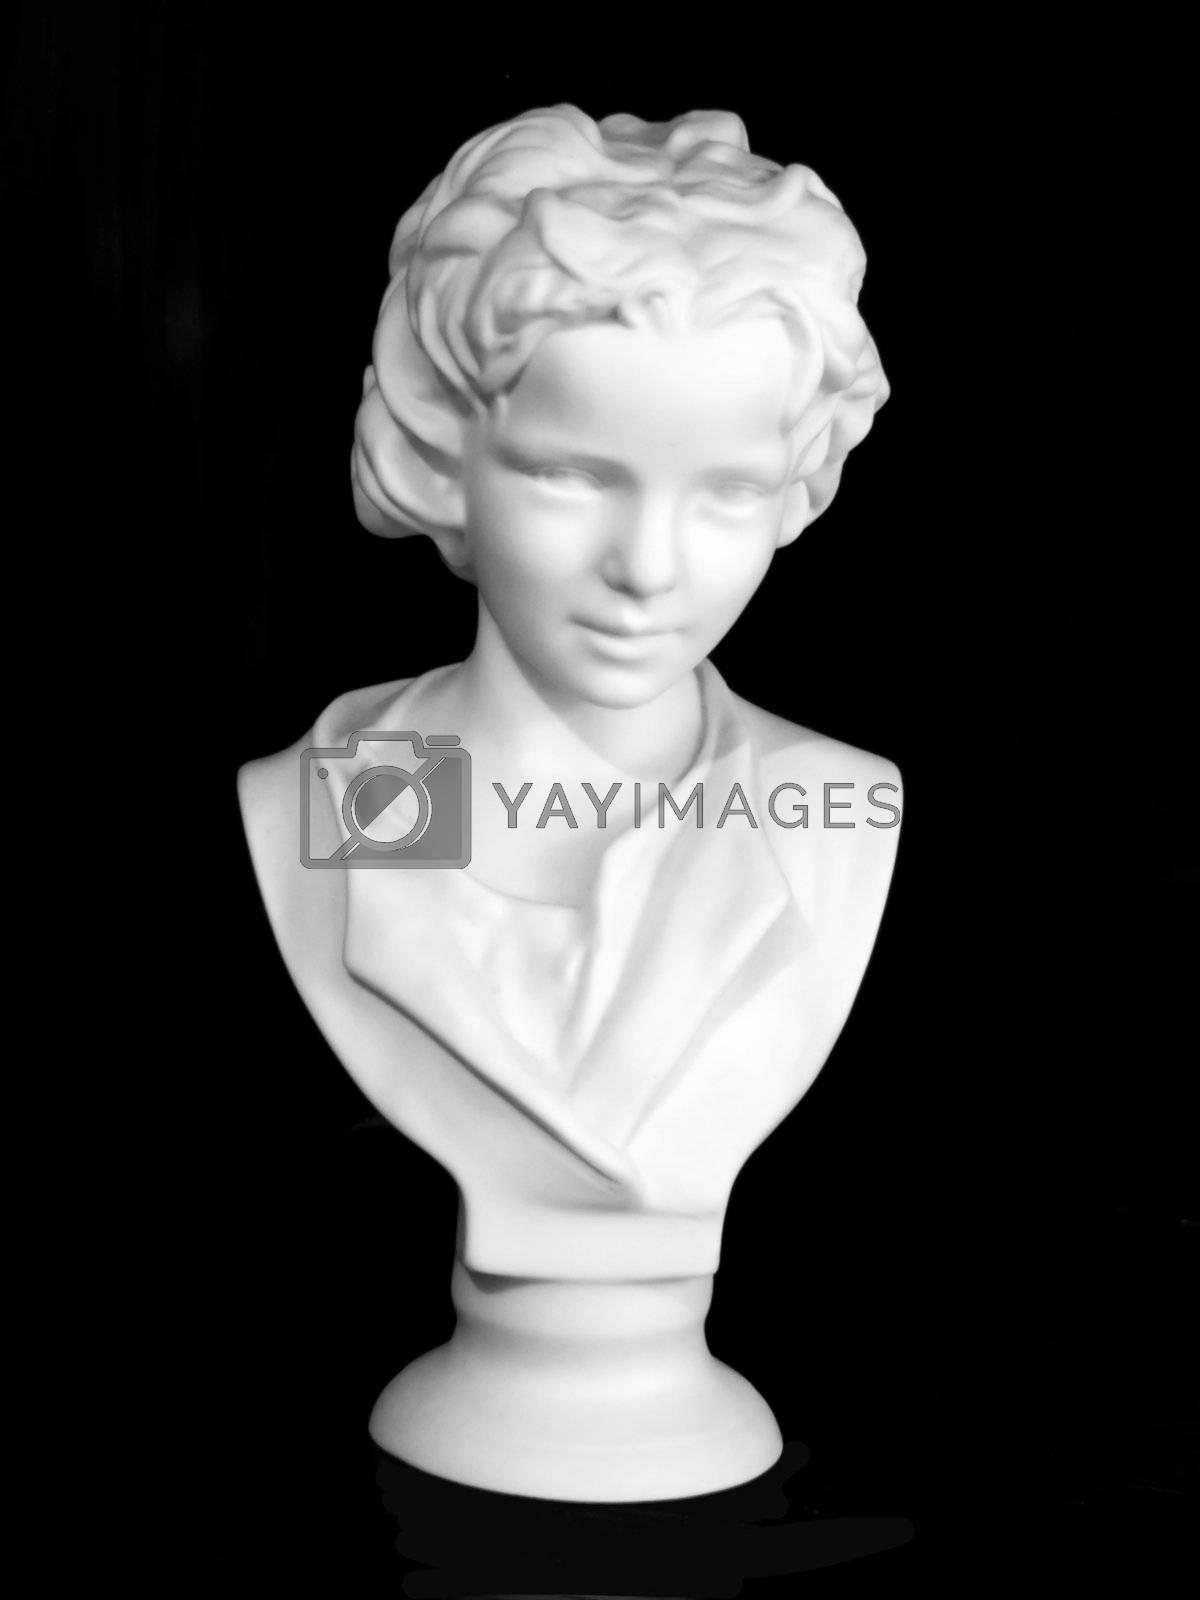 Porcelain head on black background by PauloResende